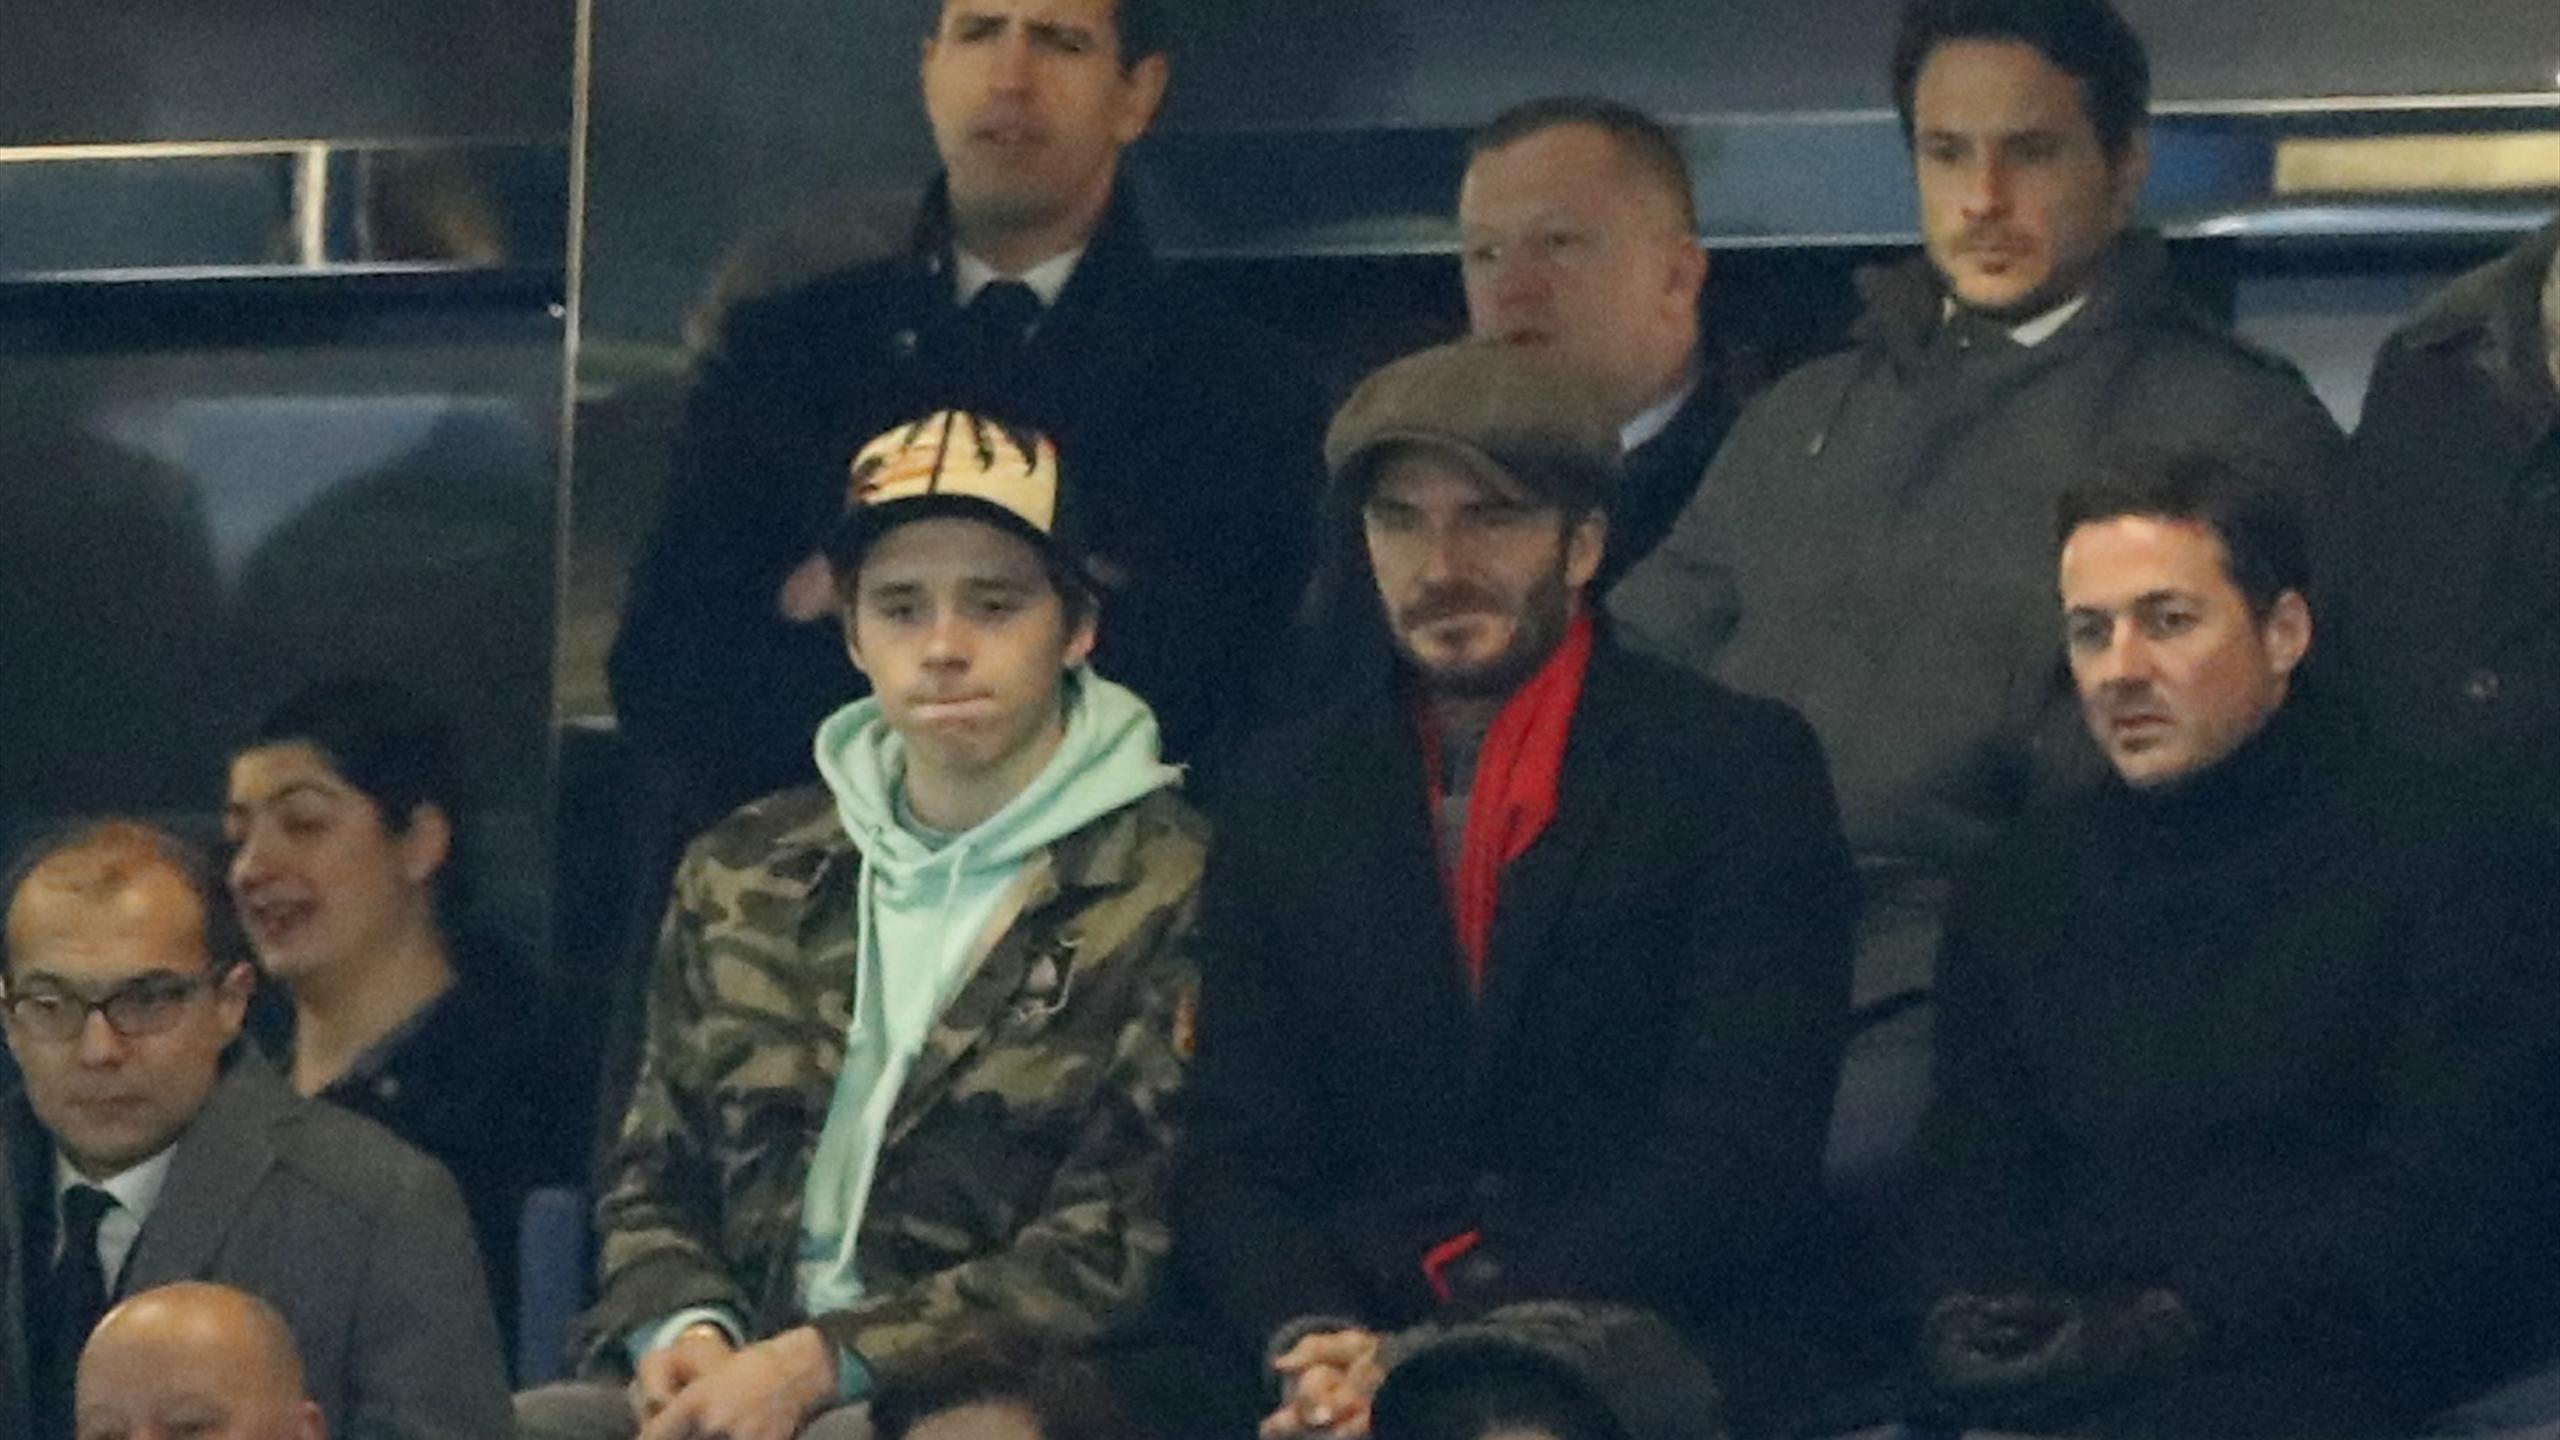 David Beckham with his son Brooklyn at Stamford Bridge for Chelsea v PSG